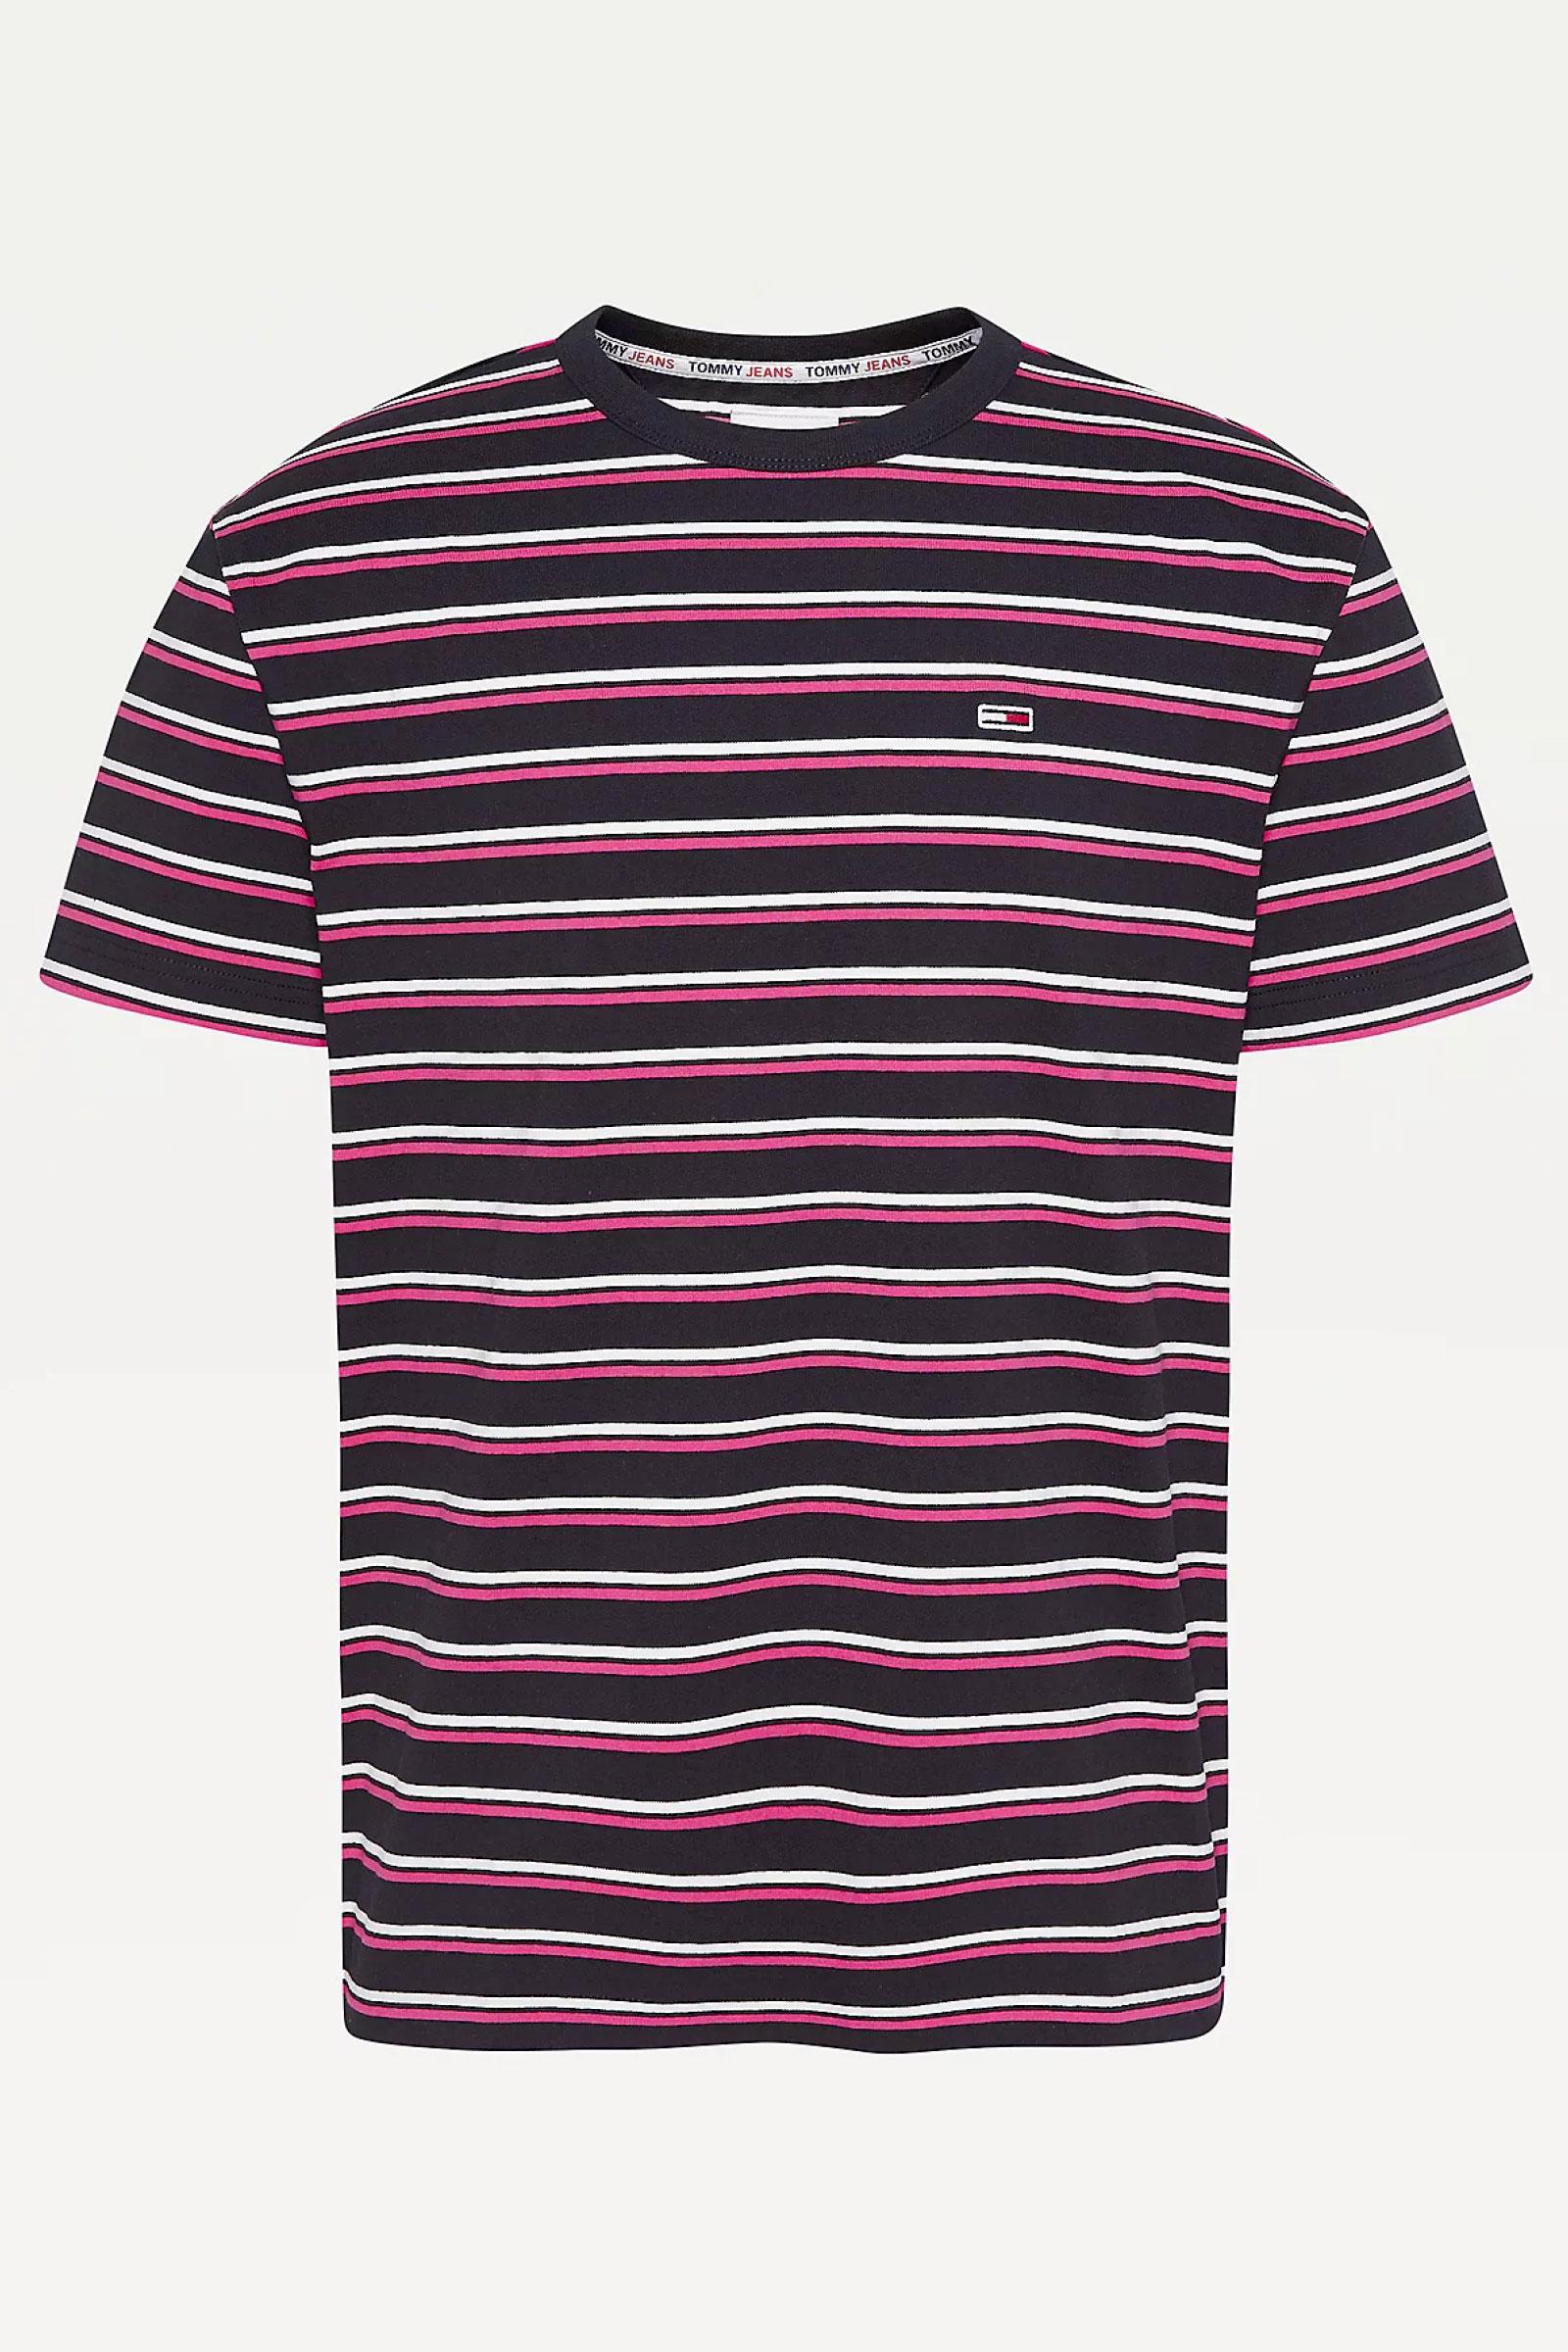 TOMMY JEANS Top Uomo TOMMY JEANS | T-Shirt | DM0DM10264T1K